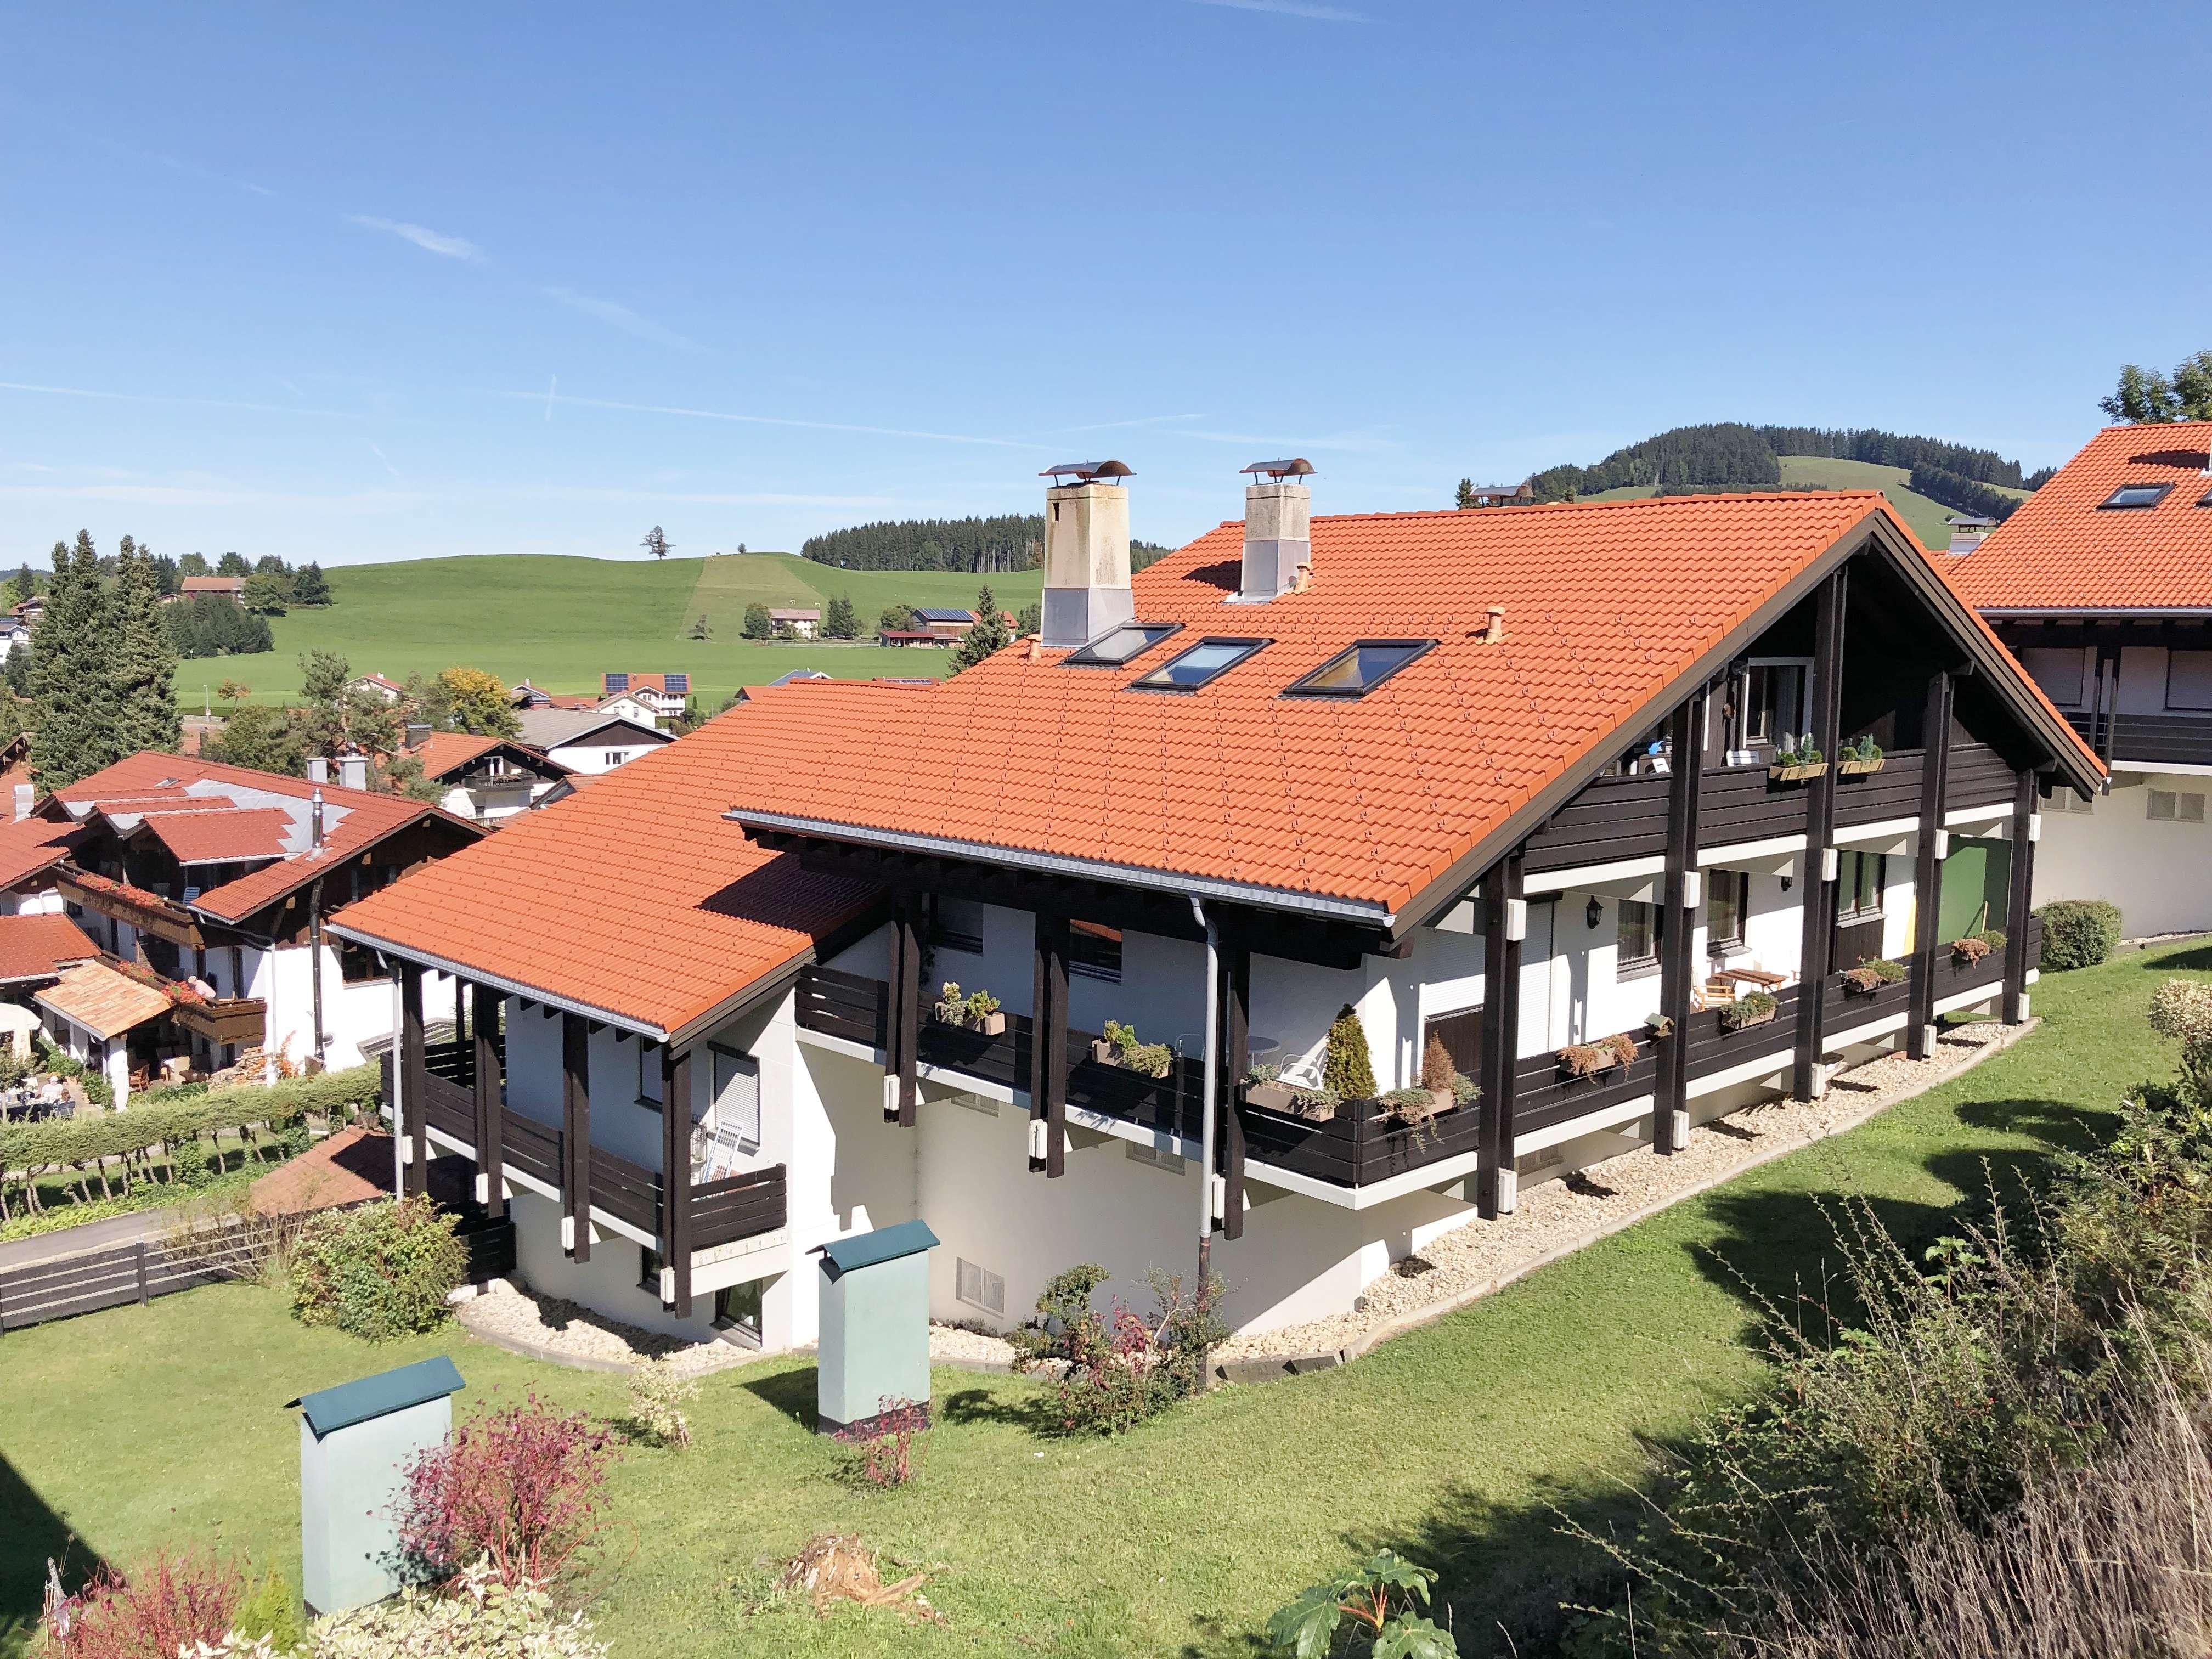 Am Staufenhang -  Grosszügige 2 - Zi.- Wohnung inkl TG - Stellplätzen in Oberstaufen in Oberstaufen